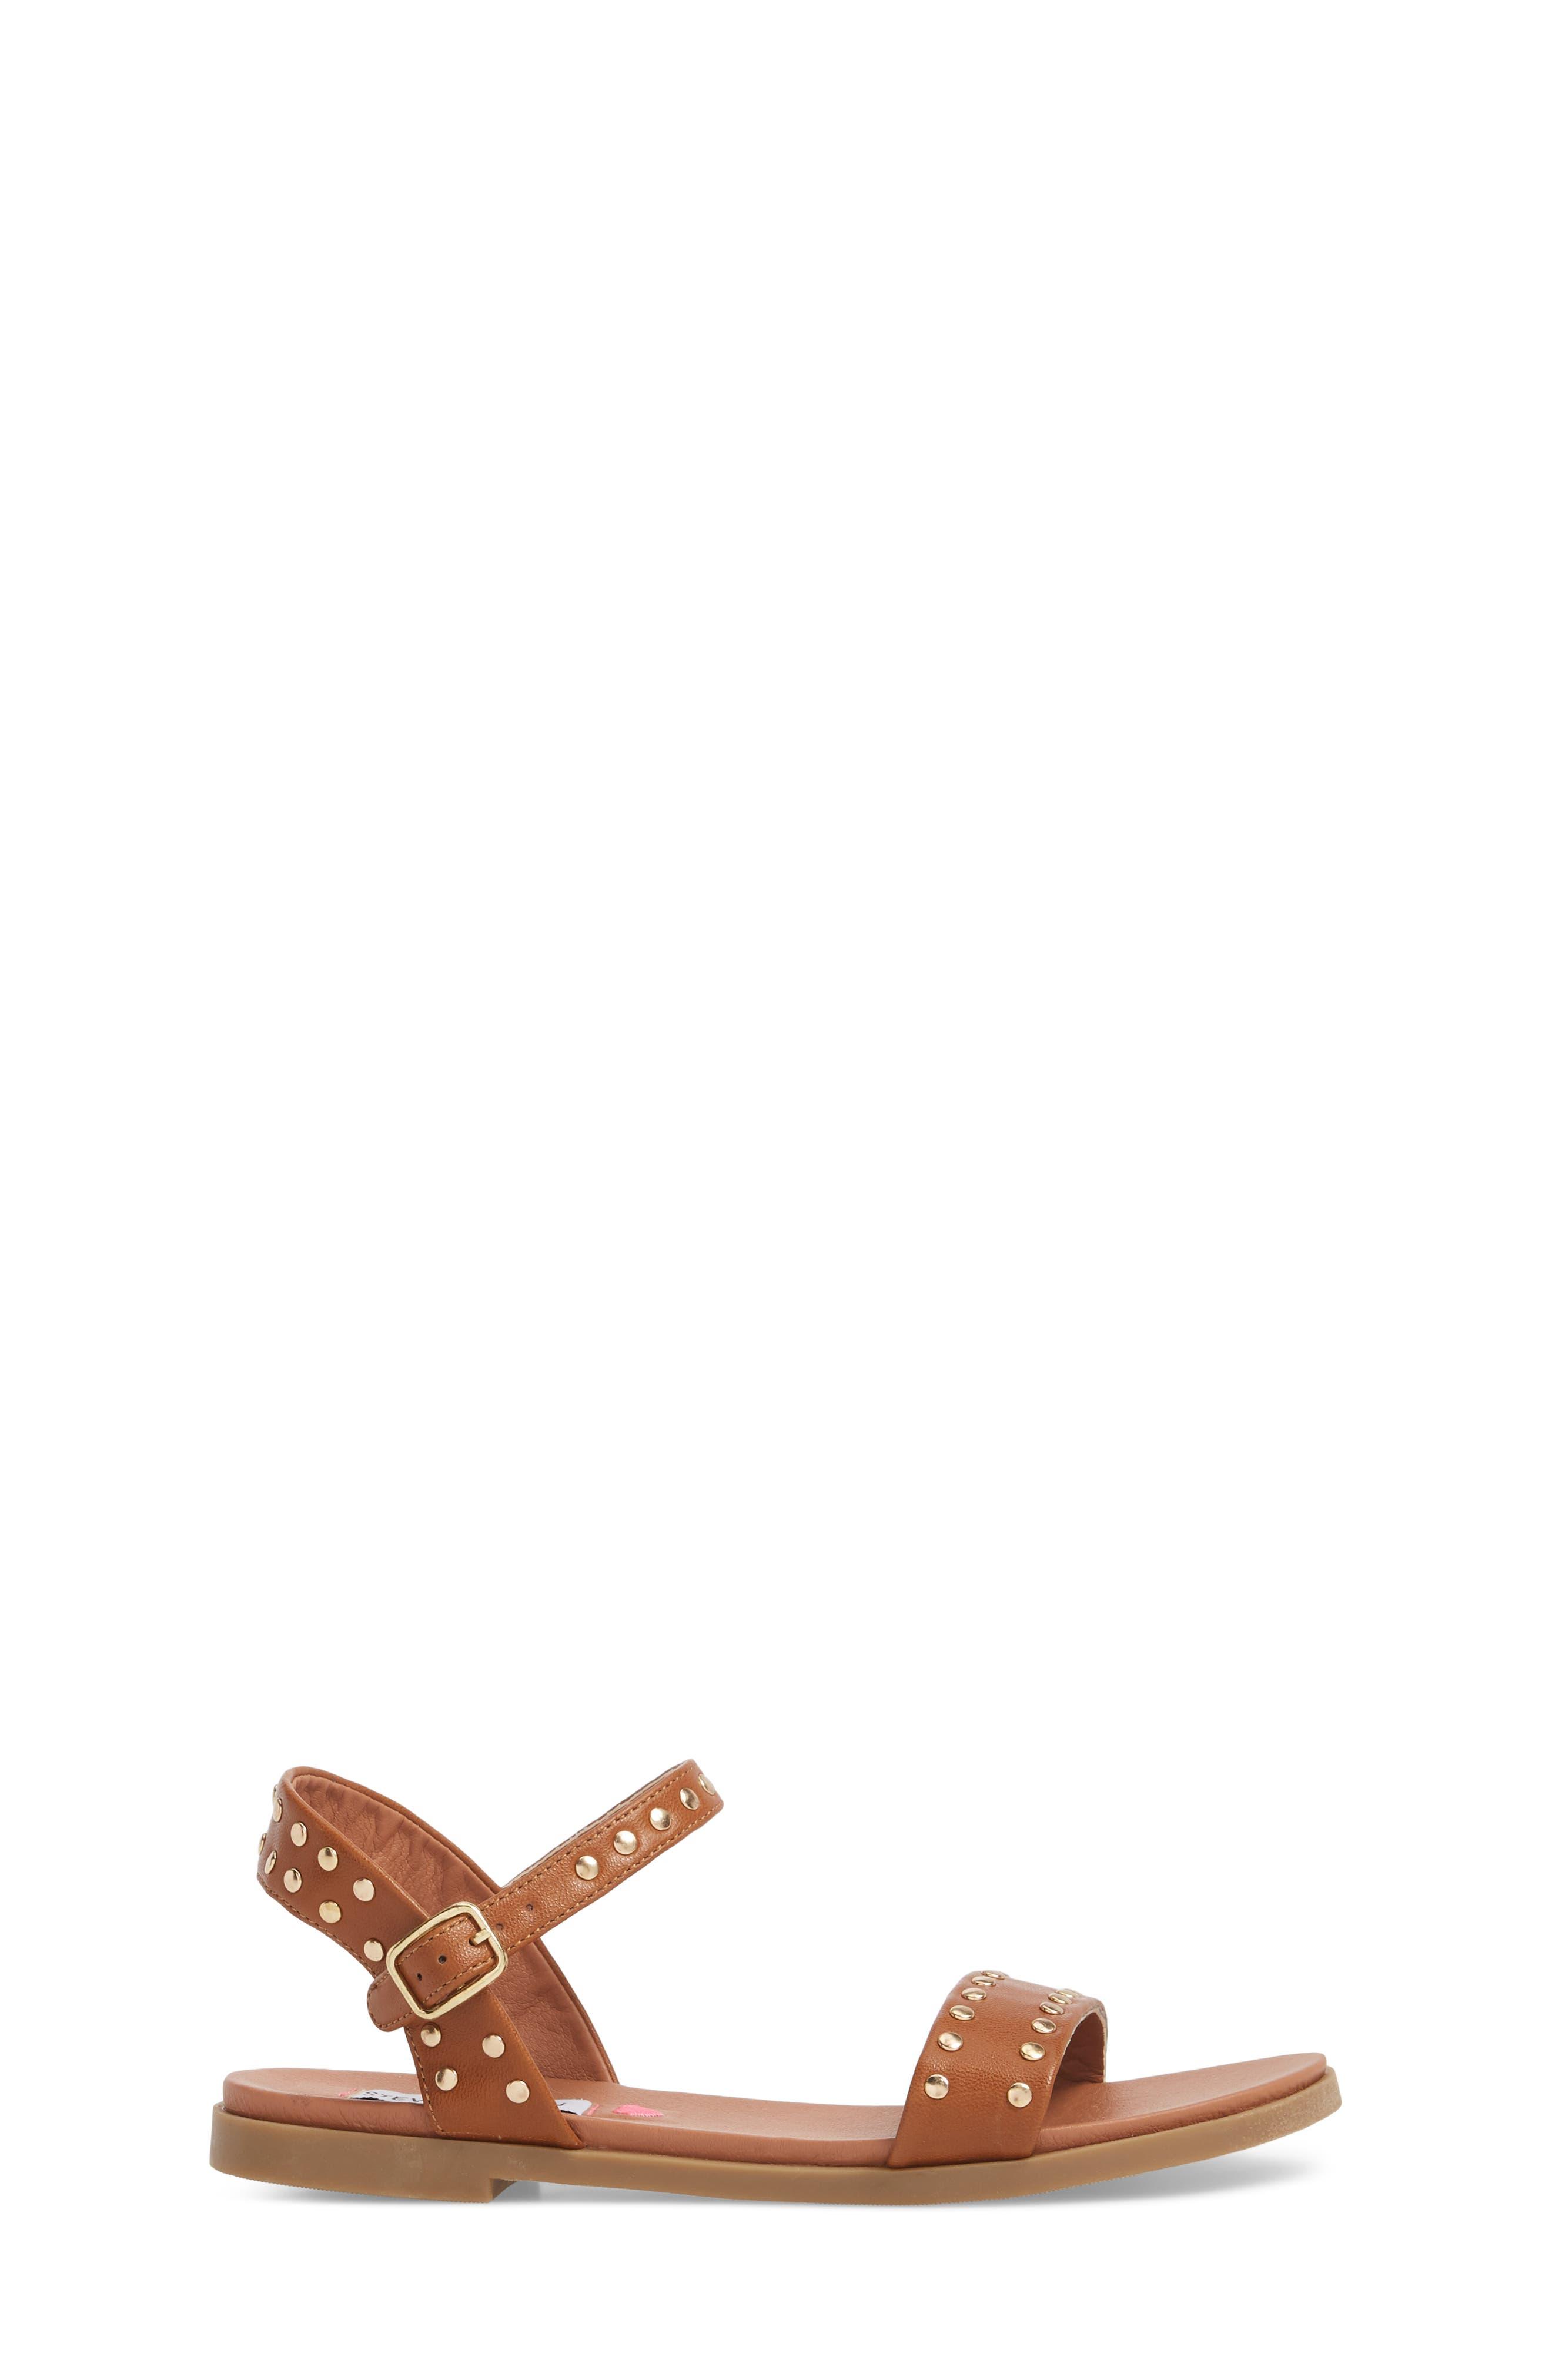 JDONDI Studded Sandal,                             Alternate thumbnail 3, color,                             Cognac